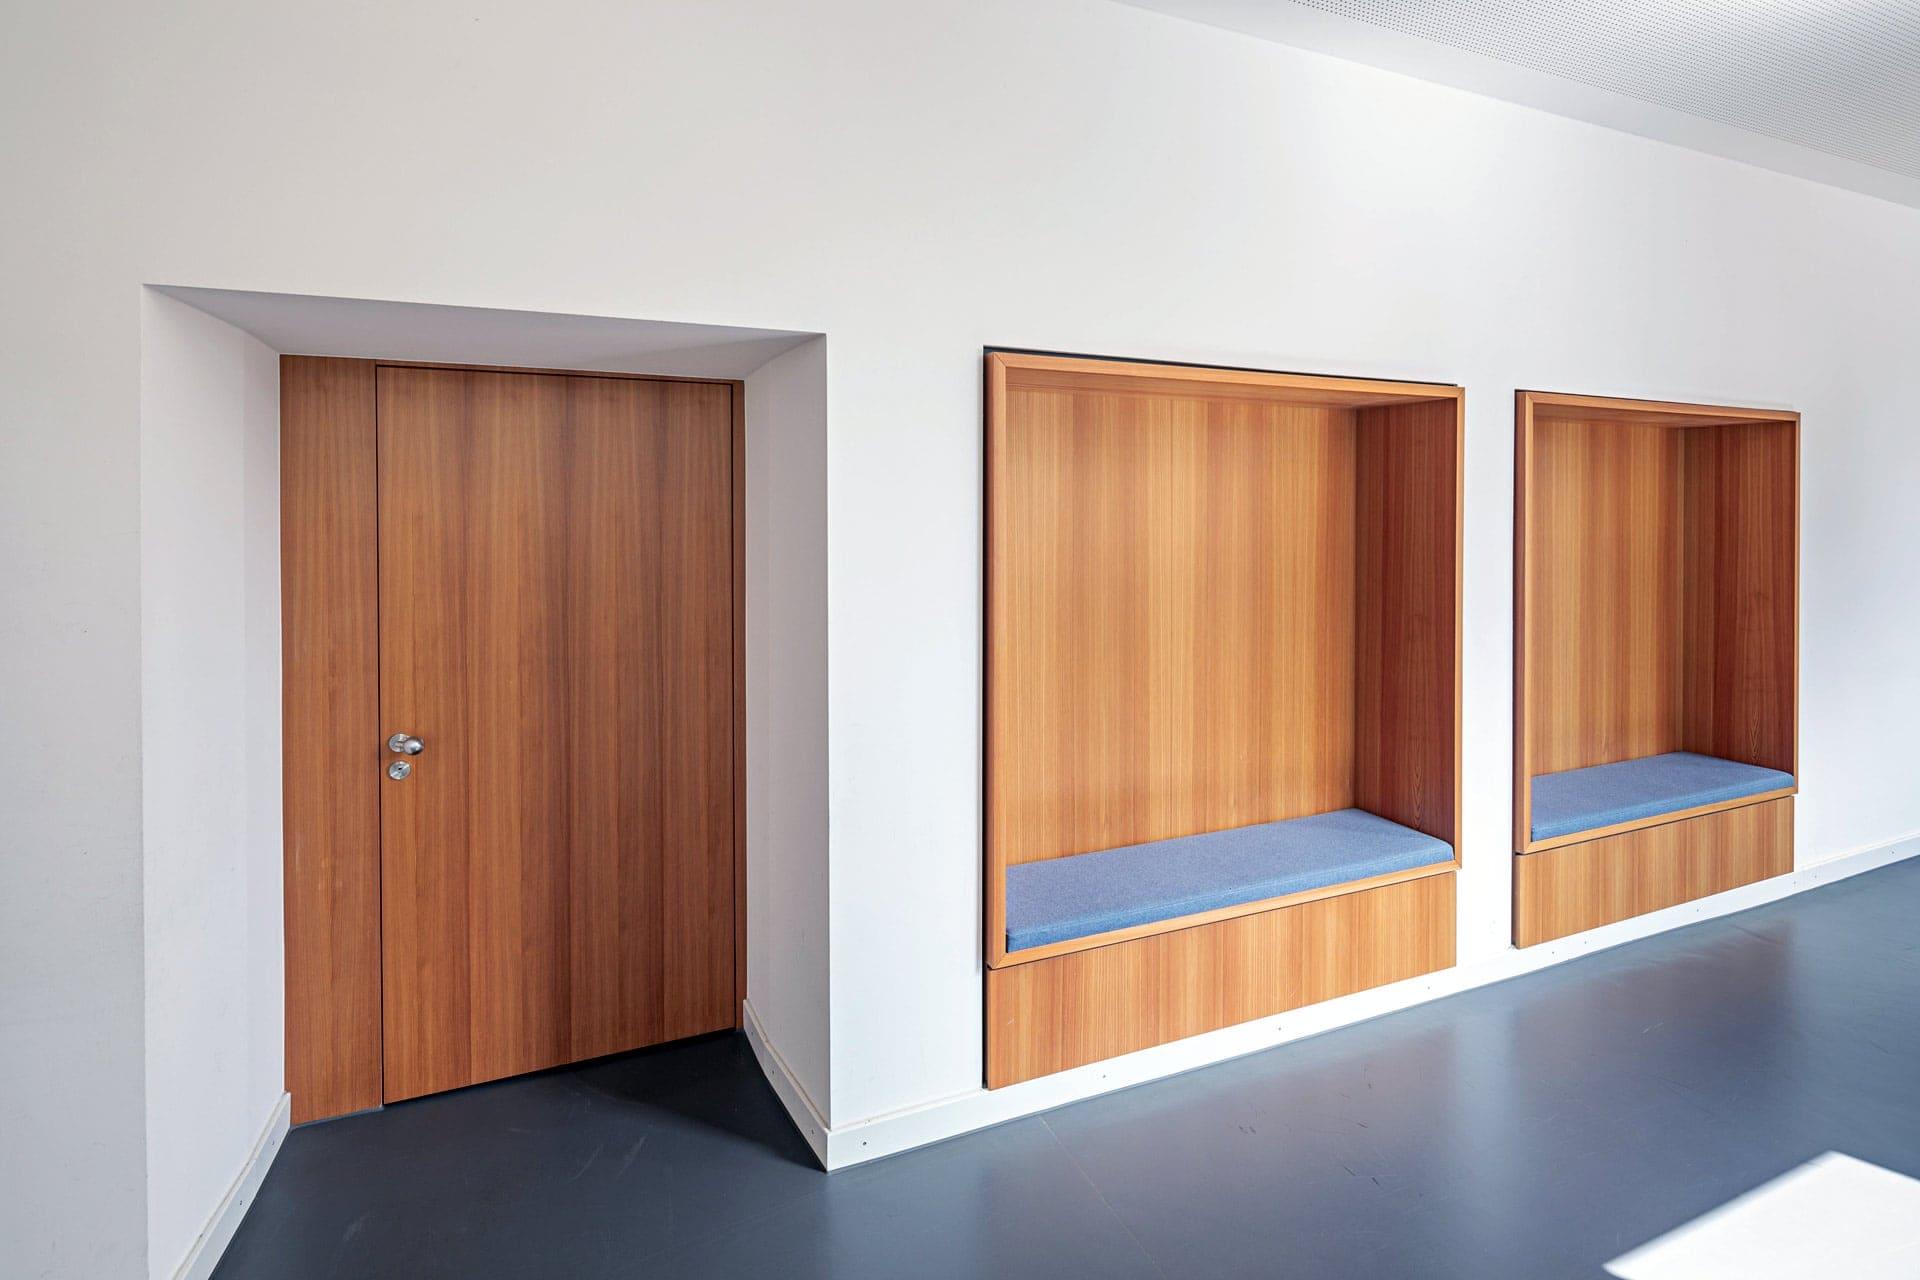 Ludwig-Thoma Gymnasium Prien Aldingerarchitekten Flur